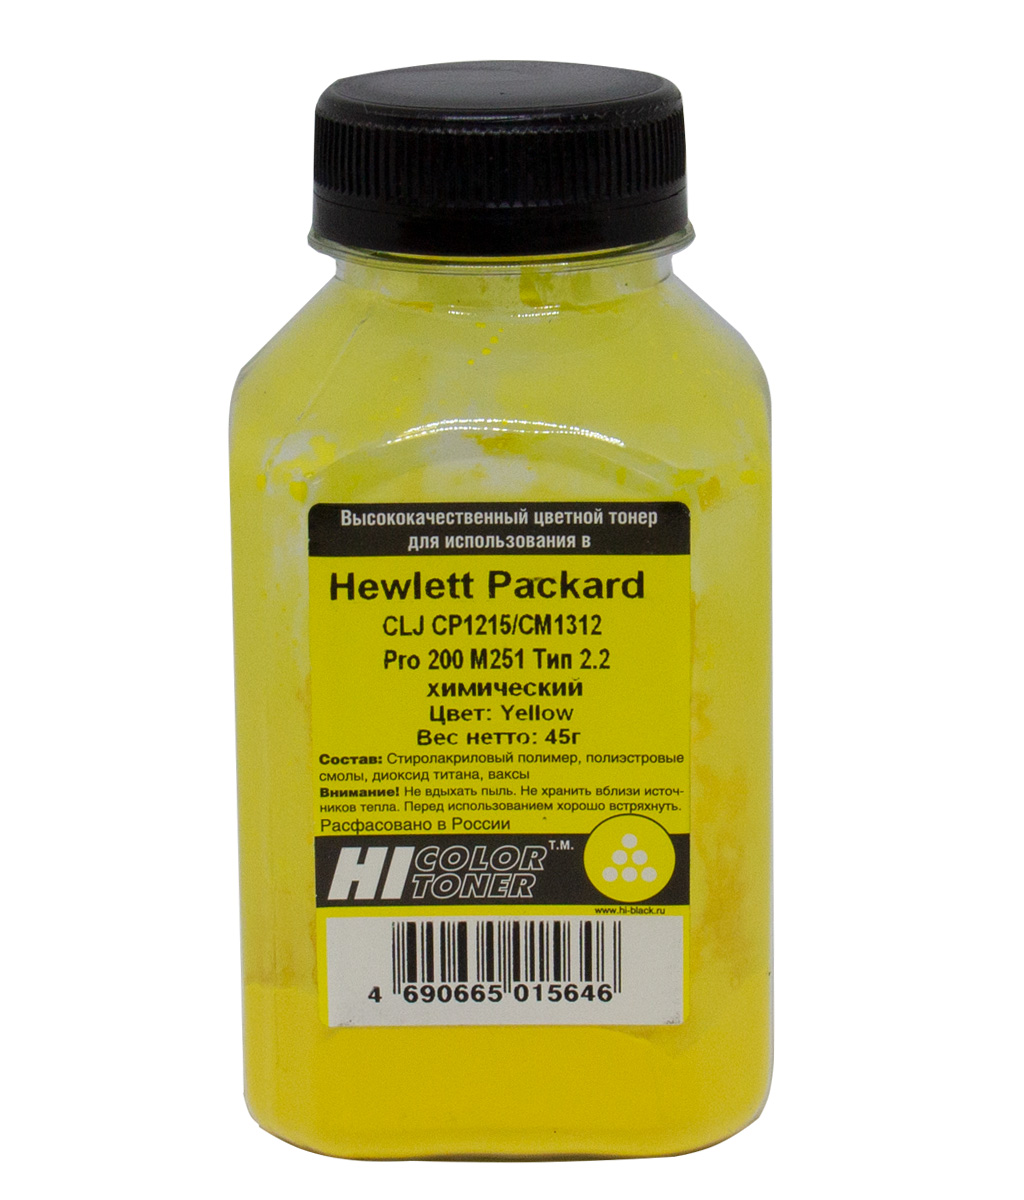 Тонер Hi-Black для HP CLJ CP1215/CM1312/Pro 200 M251, Химический, Тип 2.2, Y, 45 г, банка